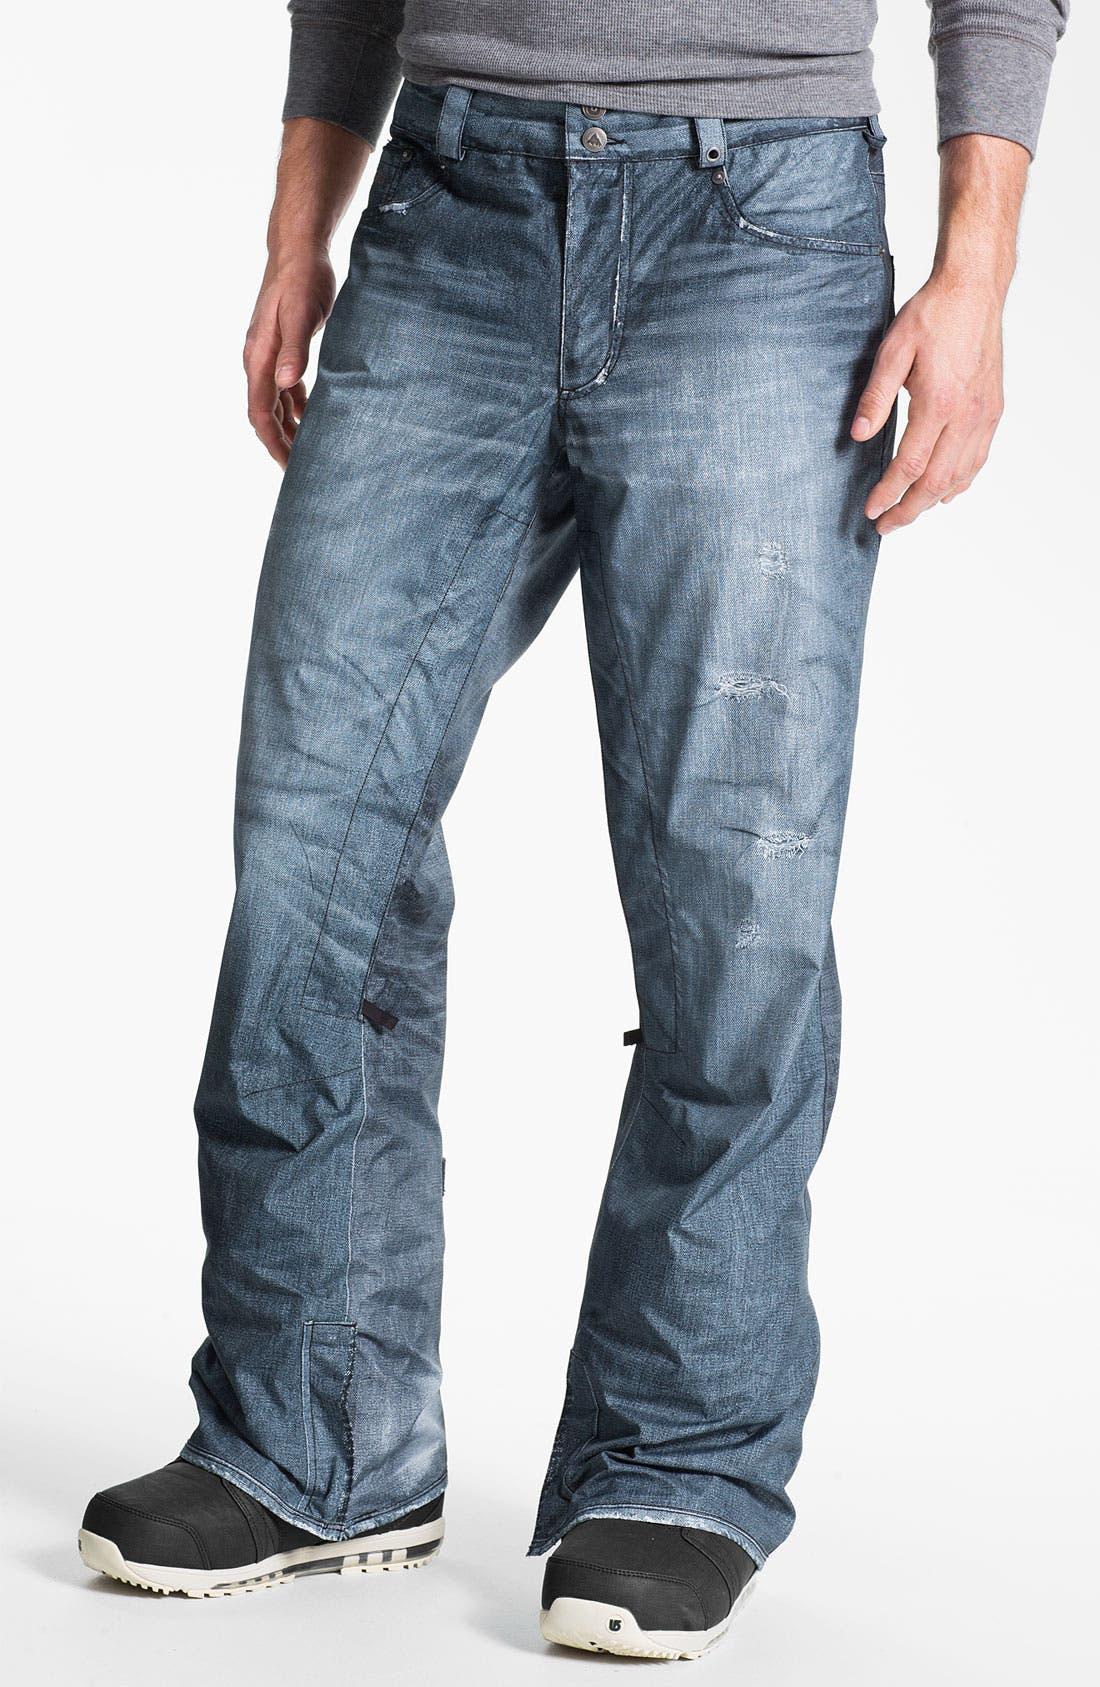 'The Jeans' Snowboard Pants,                             Main thumbnail 1, color,                             400